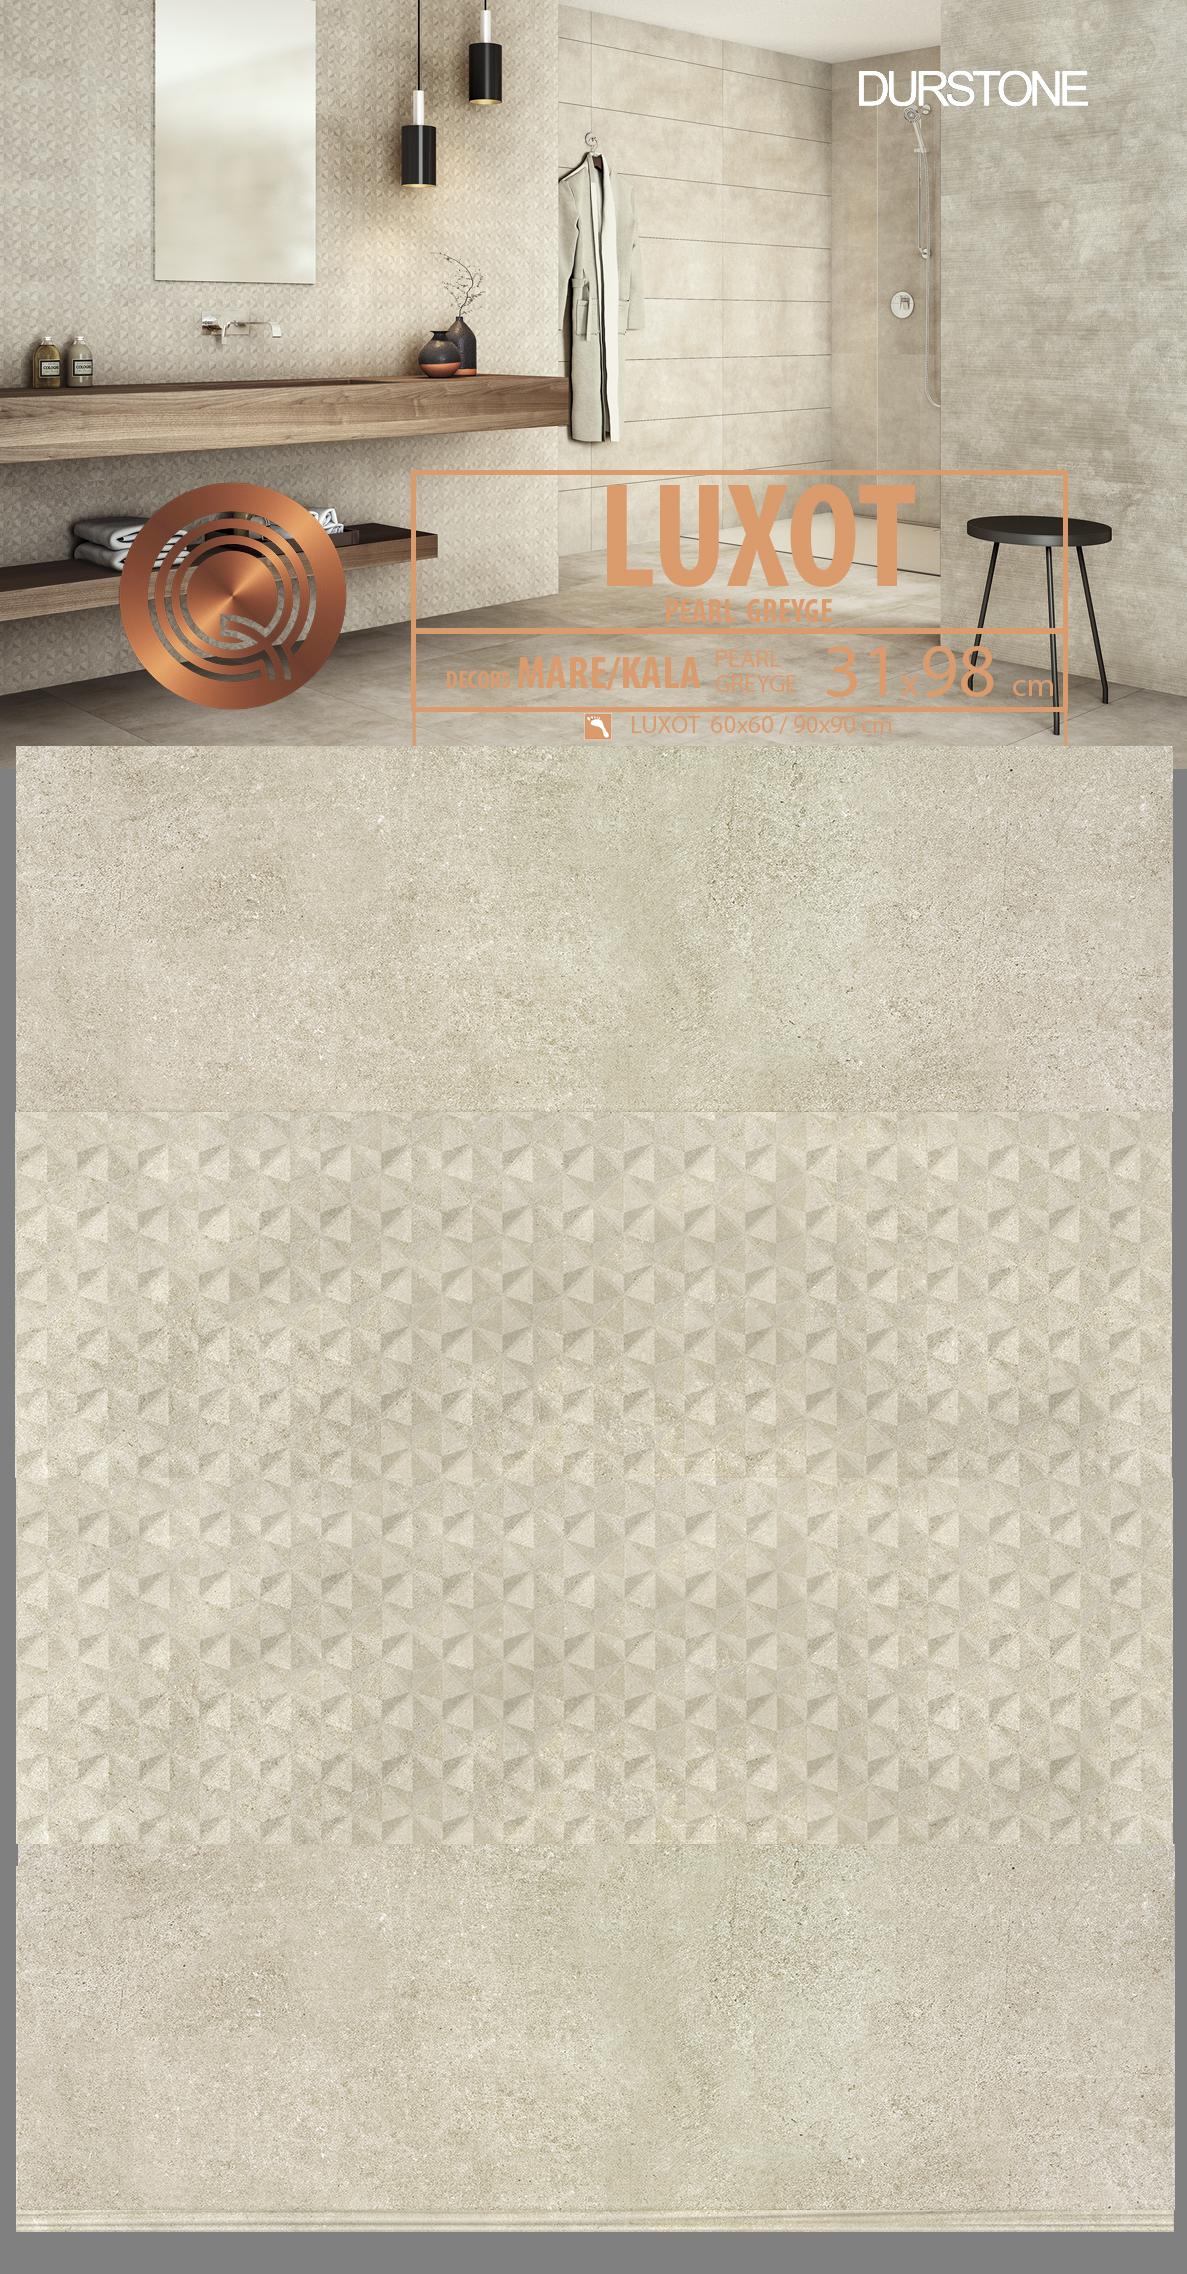 RV PANEL MIX LUXOT KALA Cod. 5665 Greyge / Cod. 5666 Pearl